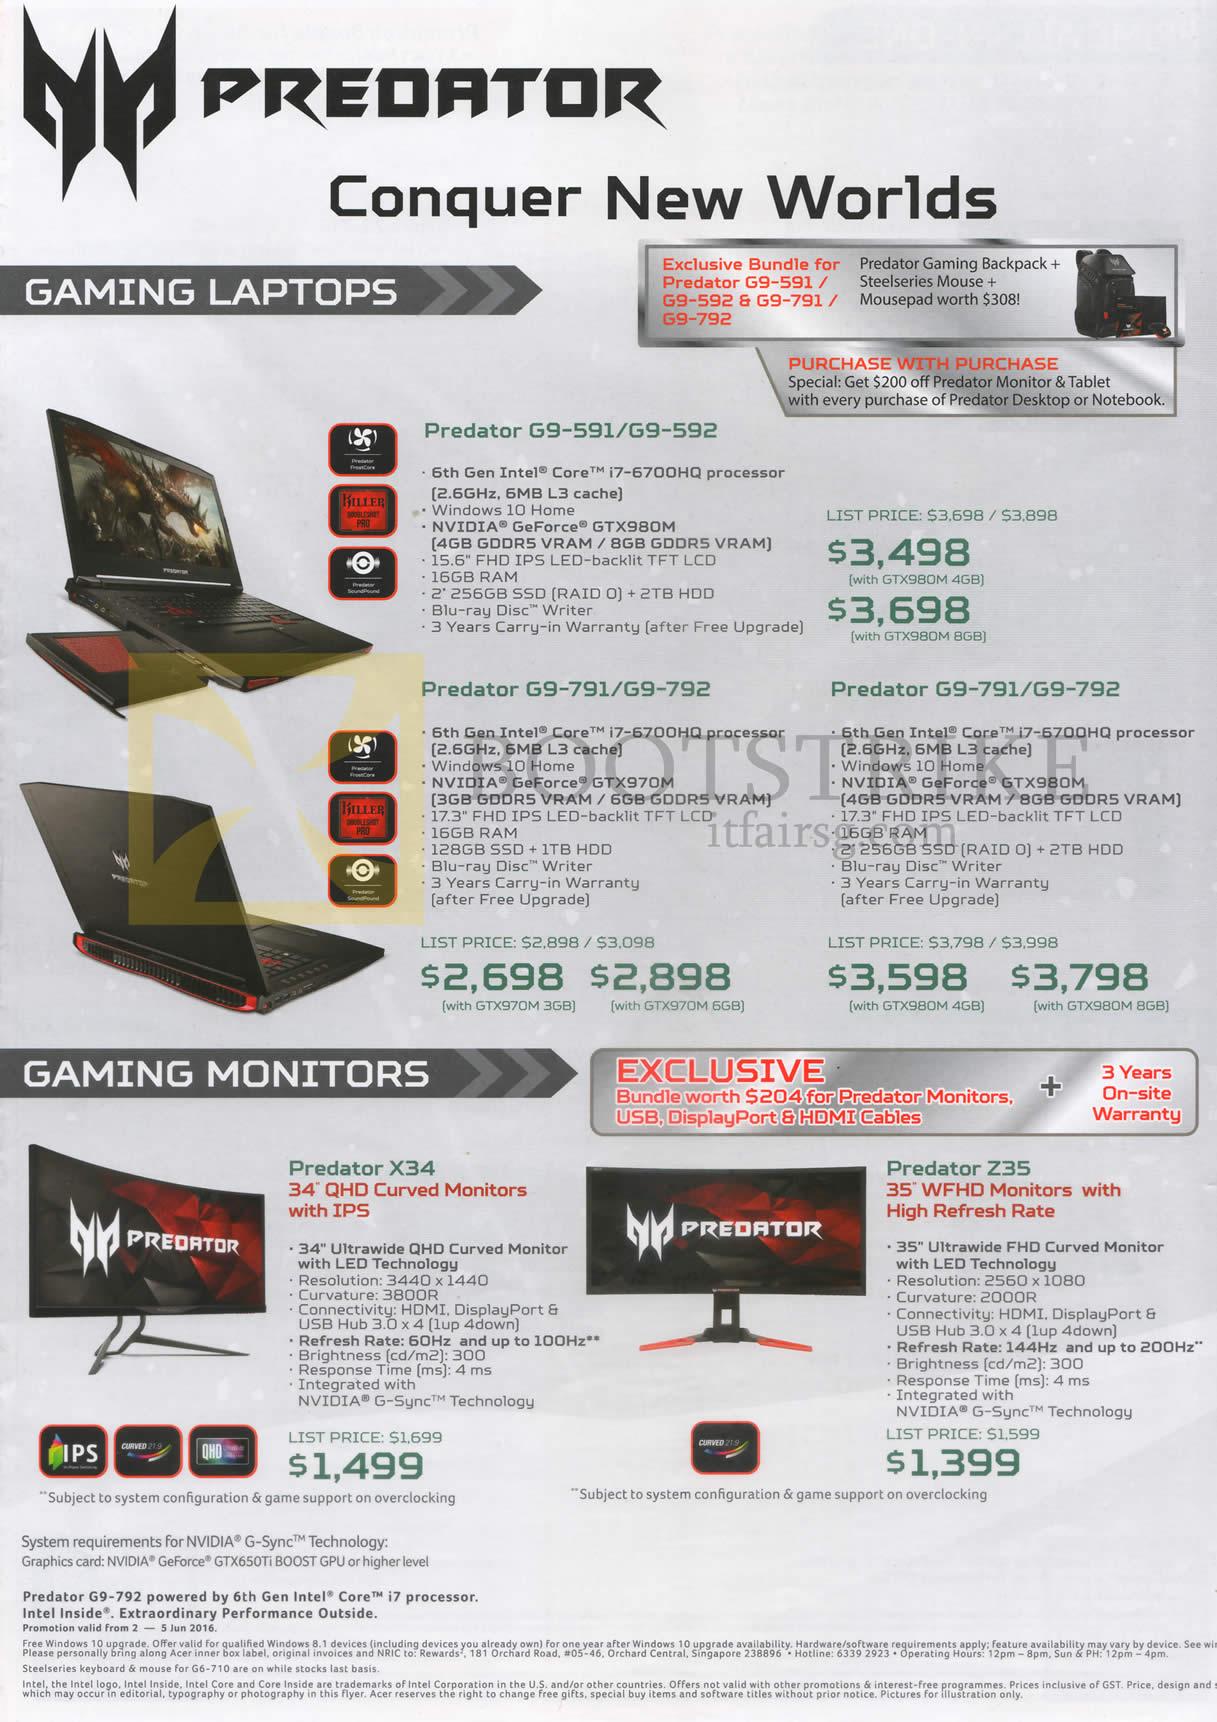 PC SHOW 2016 price list image brochure of Acer Predator Notebooks, Monitors, G9-591, 592, 791, 792, Predator X34, Z35